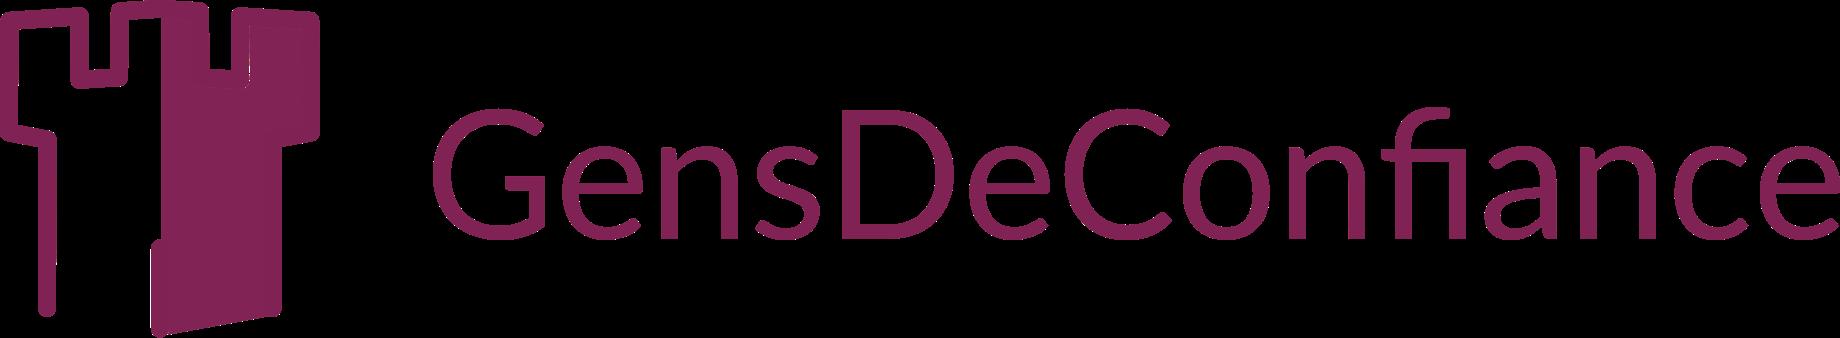 gensdeconfiance-logo